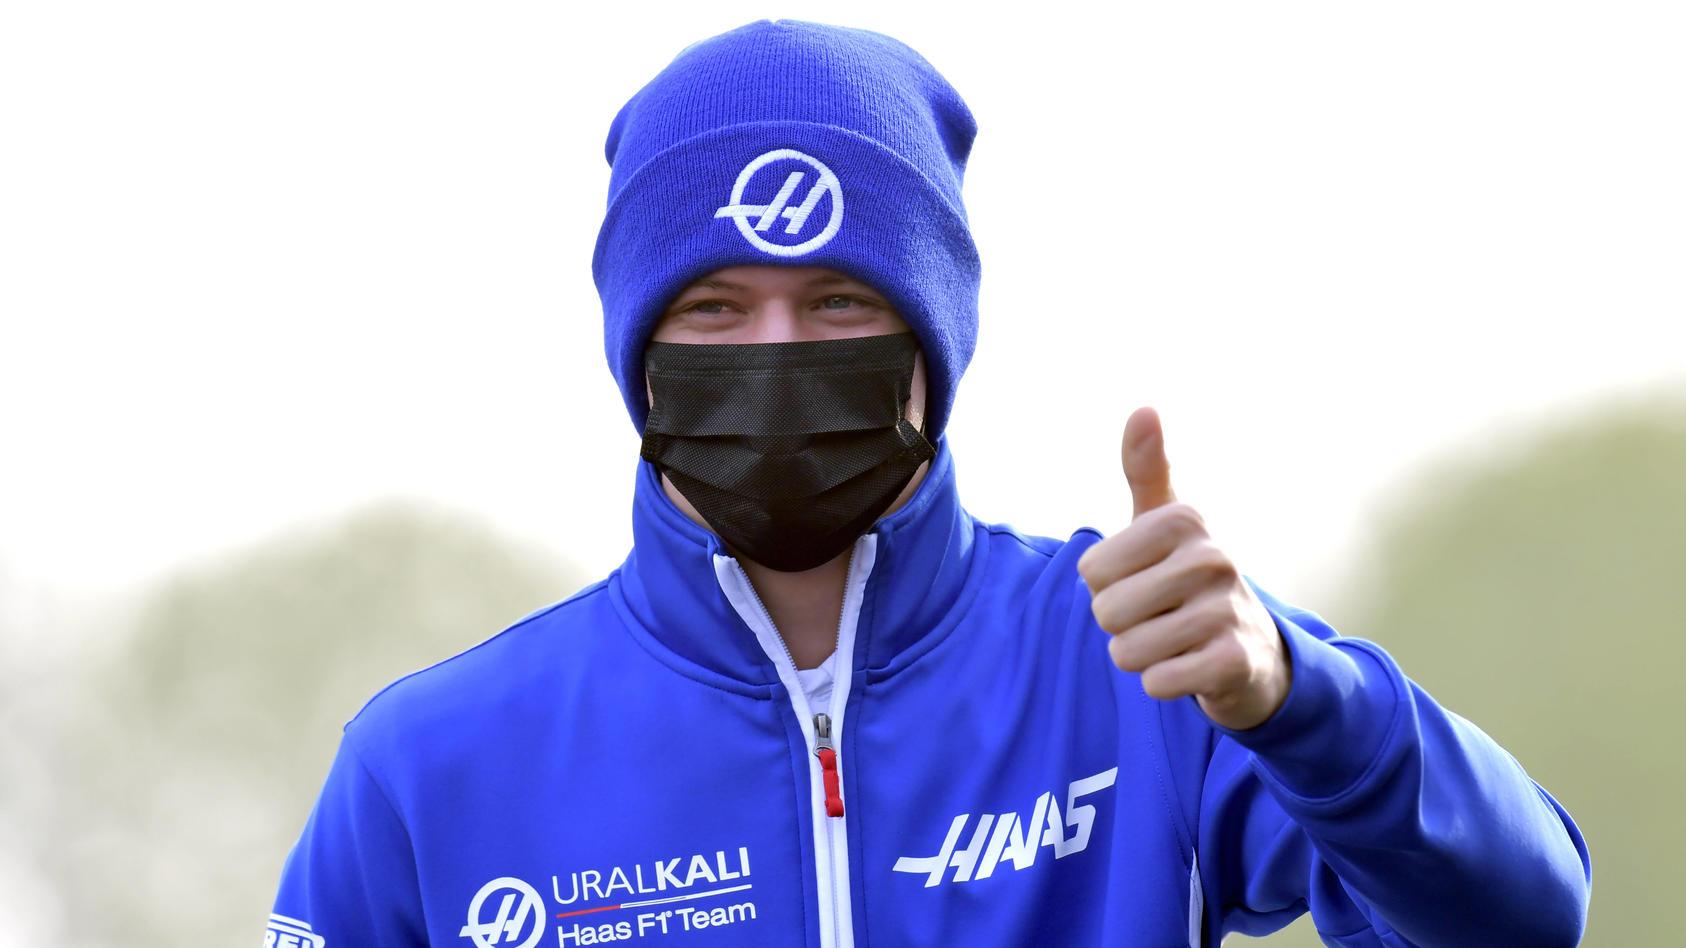 SCHUMACHER Mick Haas F1 Team FIA Formel 1 Saison 2021 in Imola am 17. 04. 2021 in Imola *** SCHUMACHER Mick Haas F1 Team